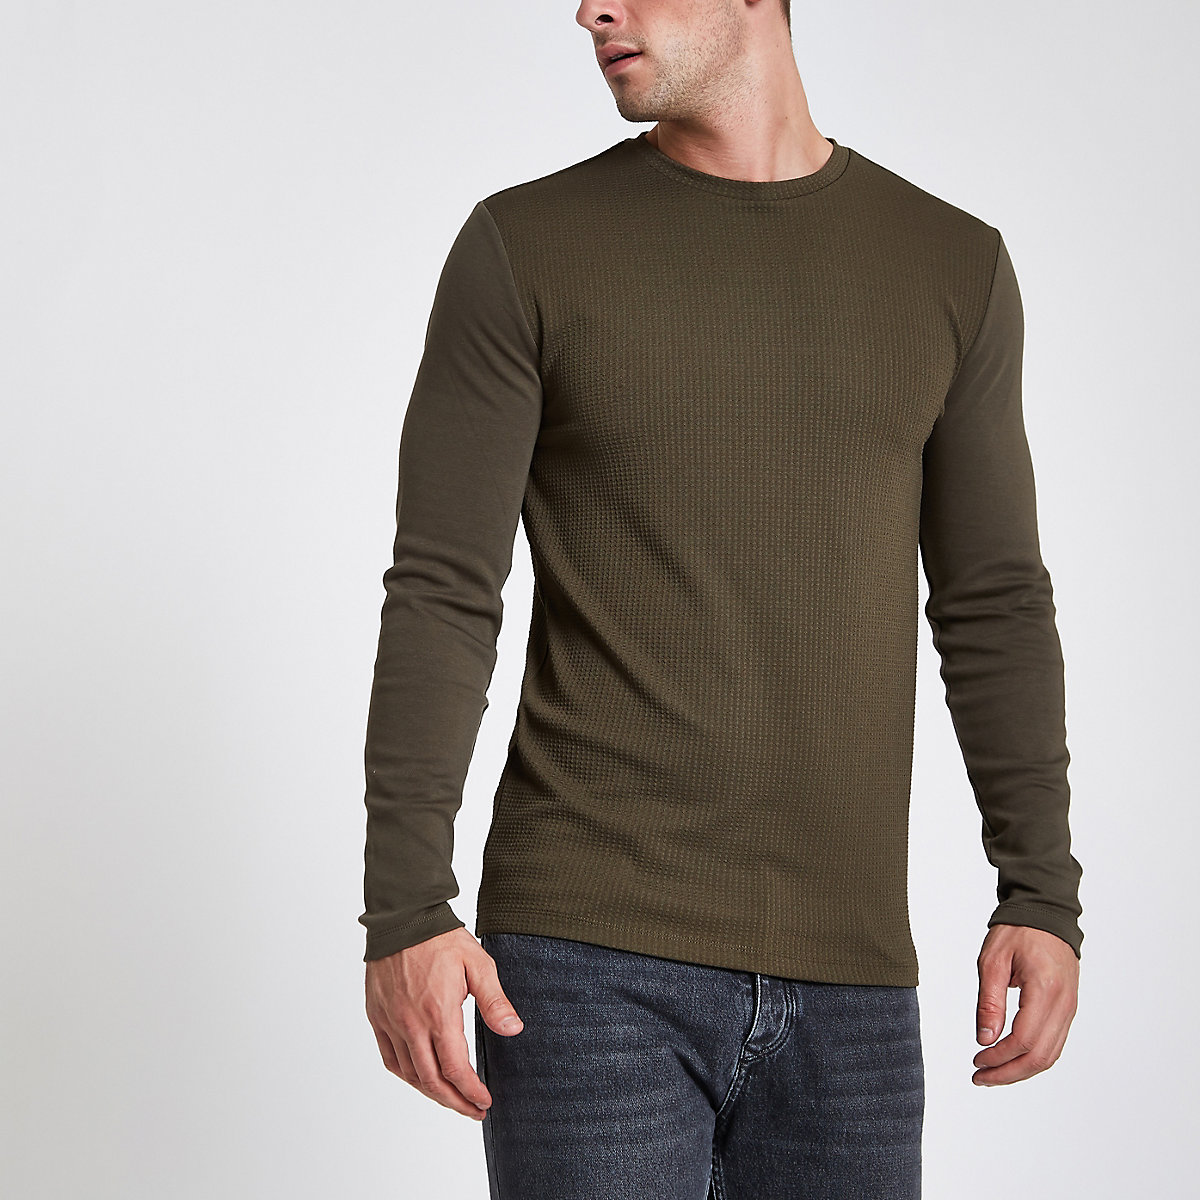 Khaki green slim fit long sleeve top